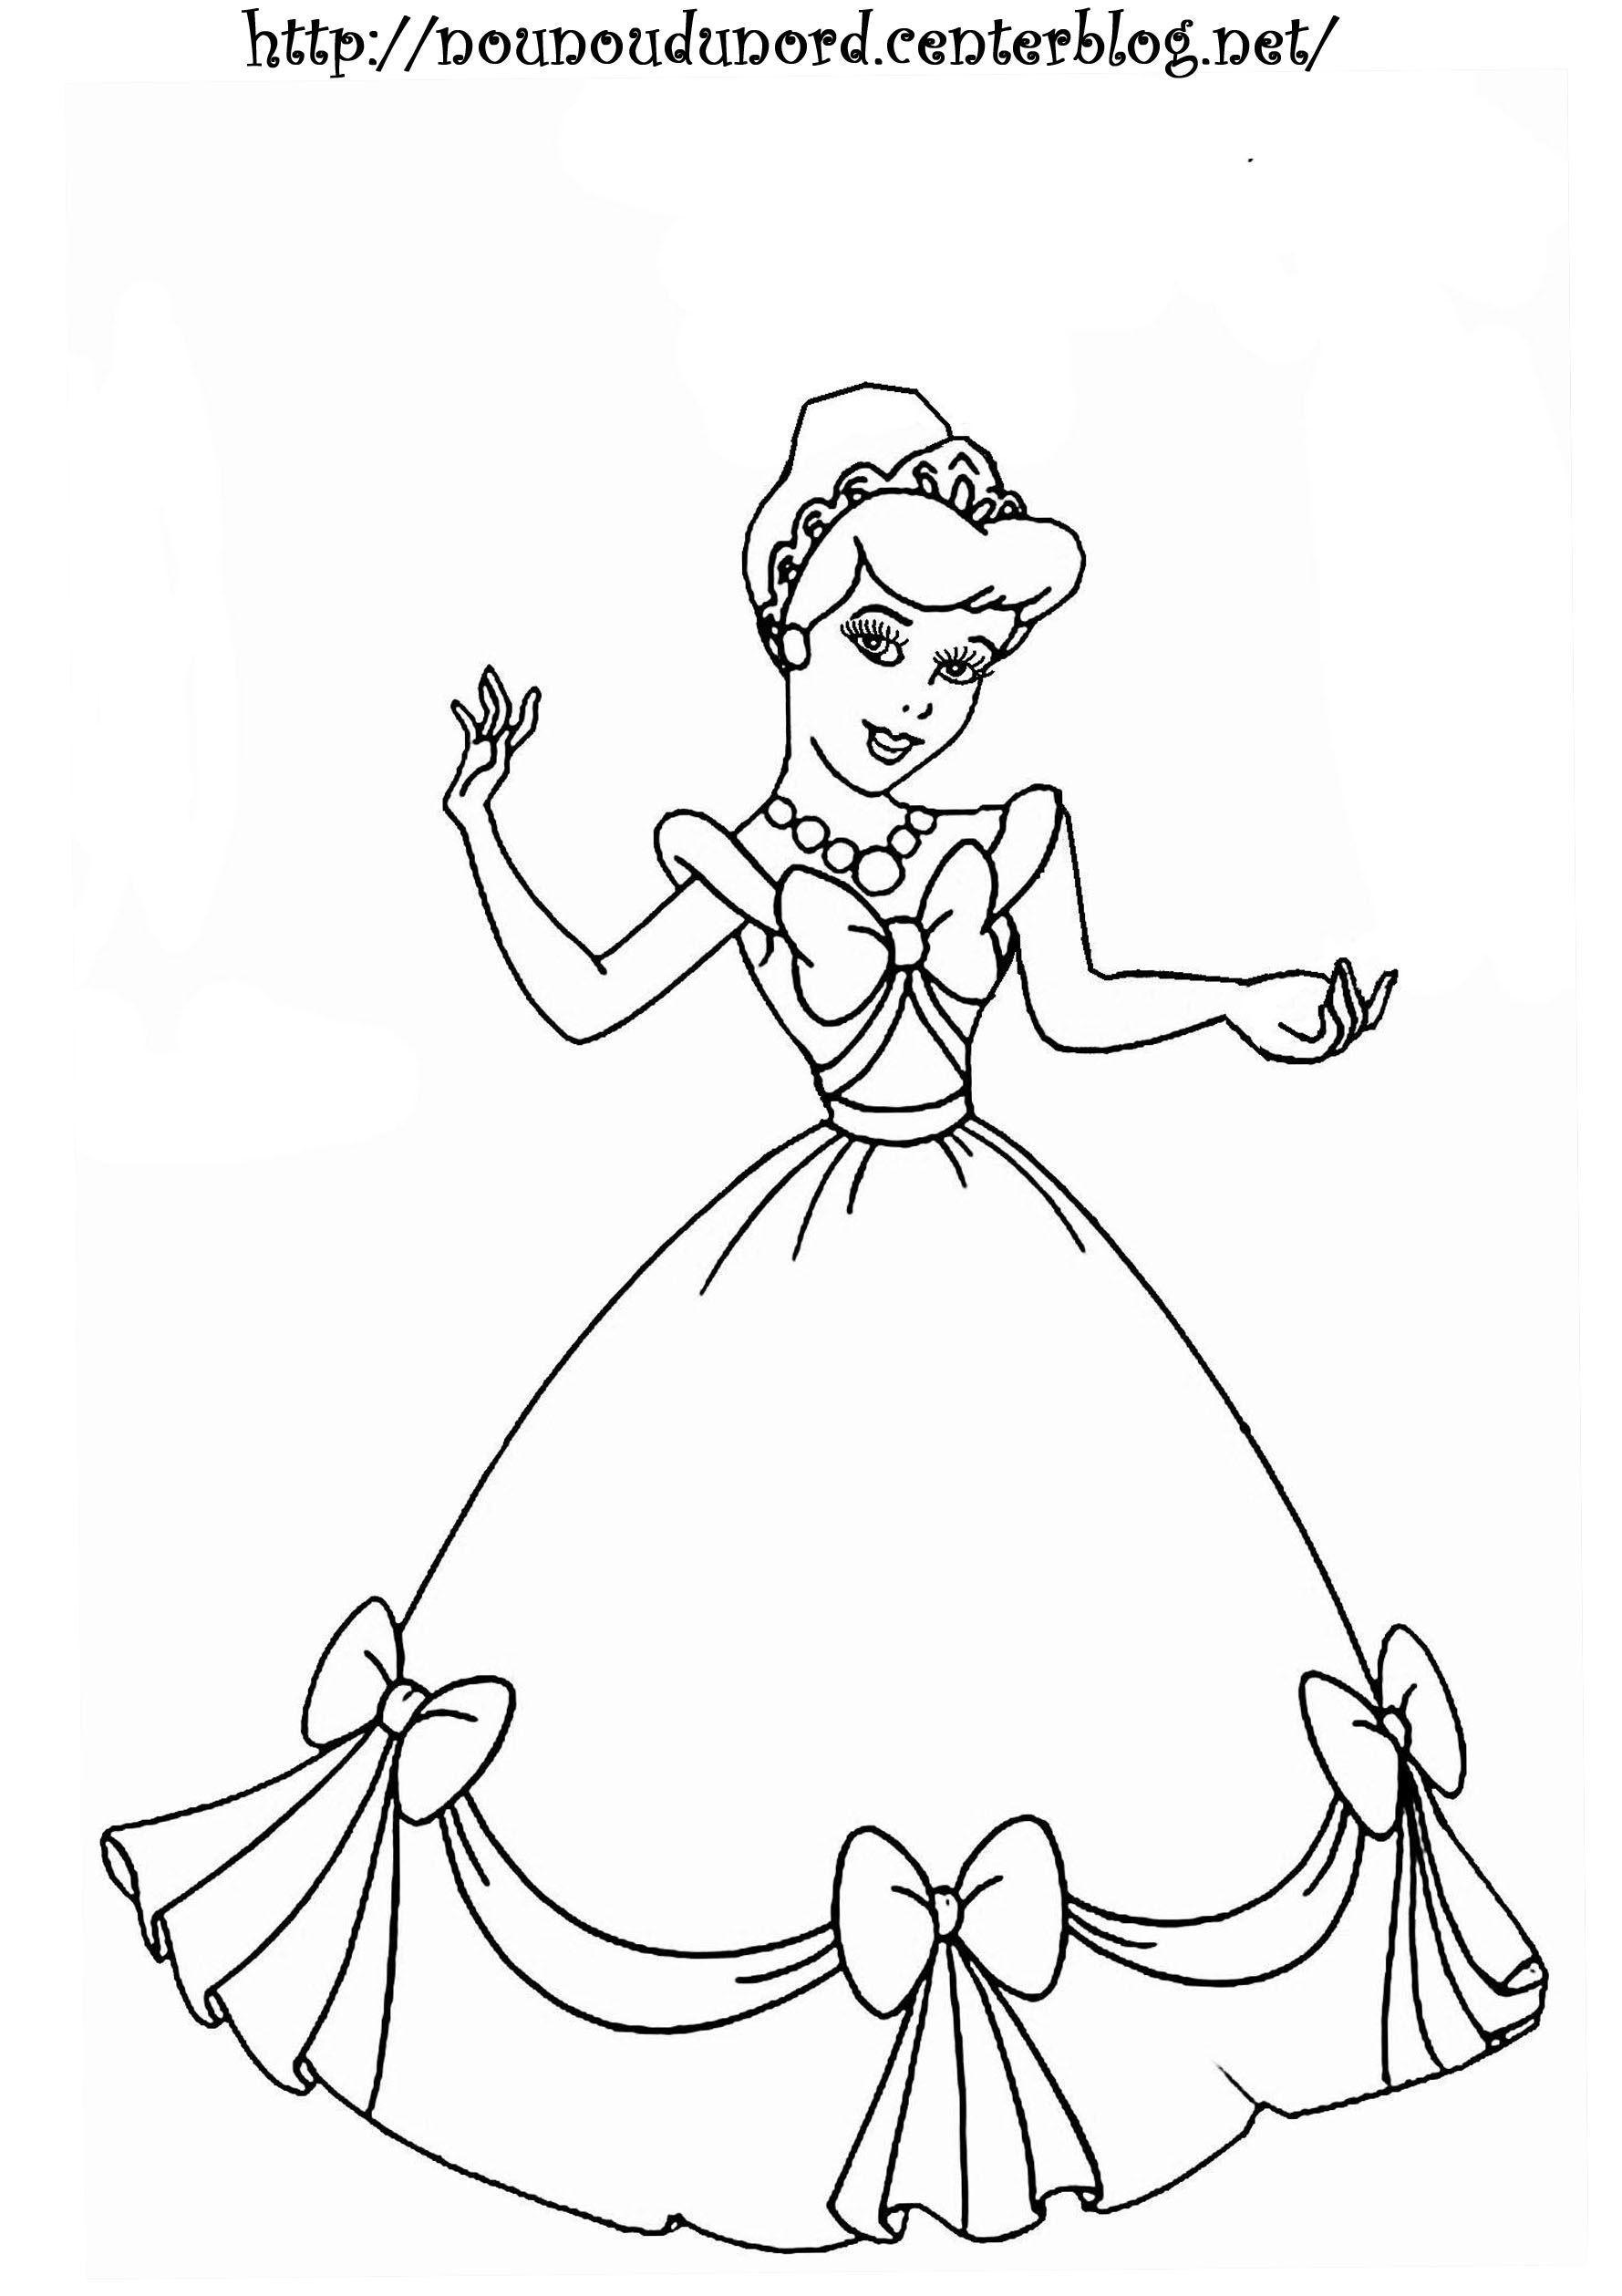 Coloriage Princesse A Imprimer destiné Coloriage A Imprimer Licorne Et Princesse